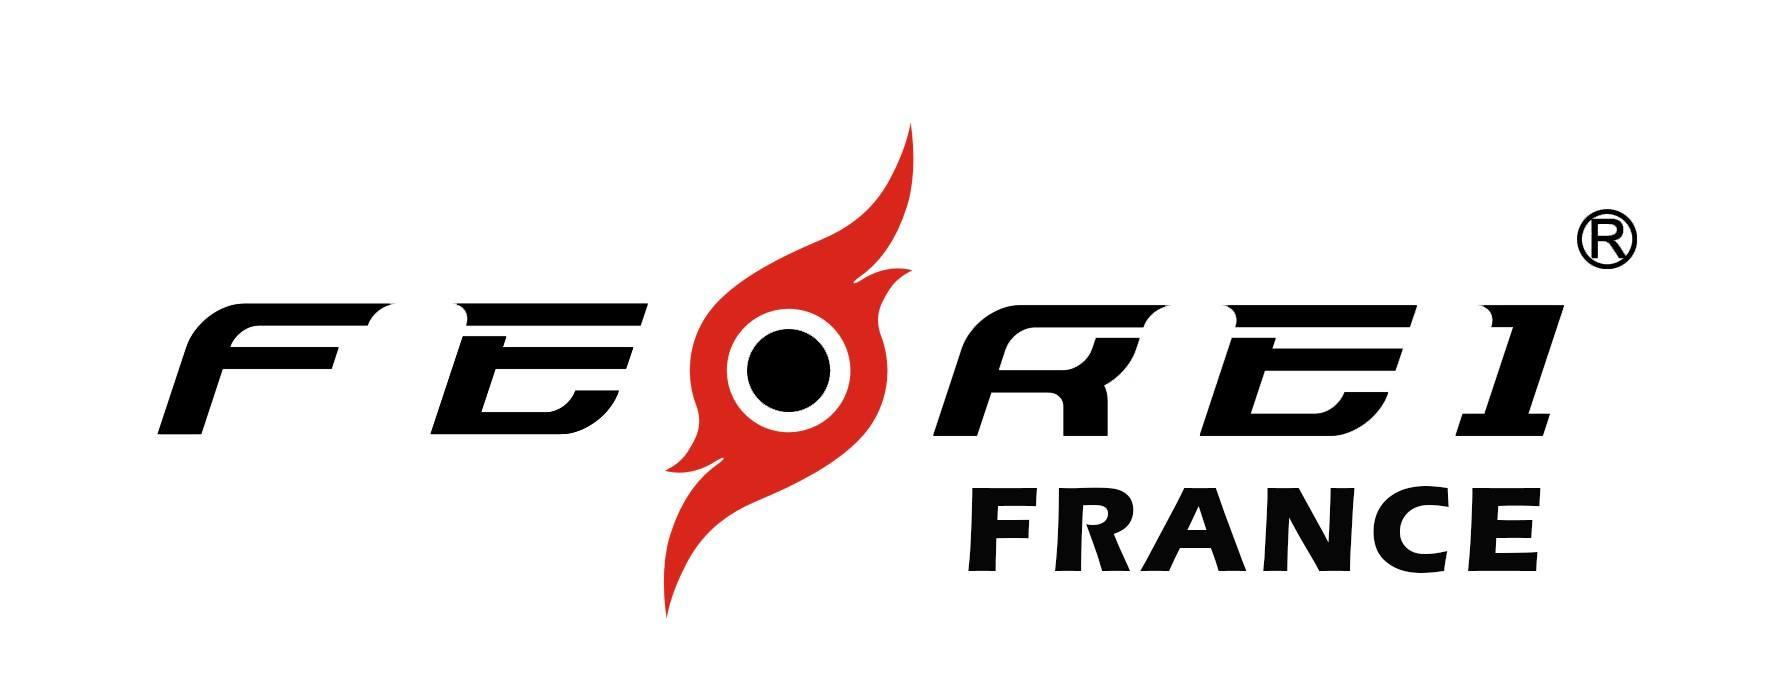 FereiFrance